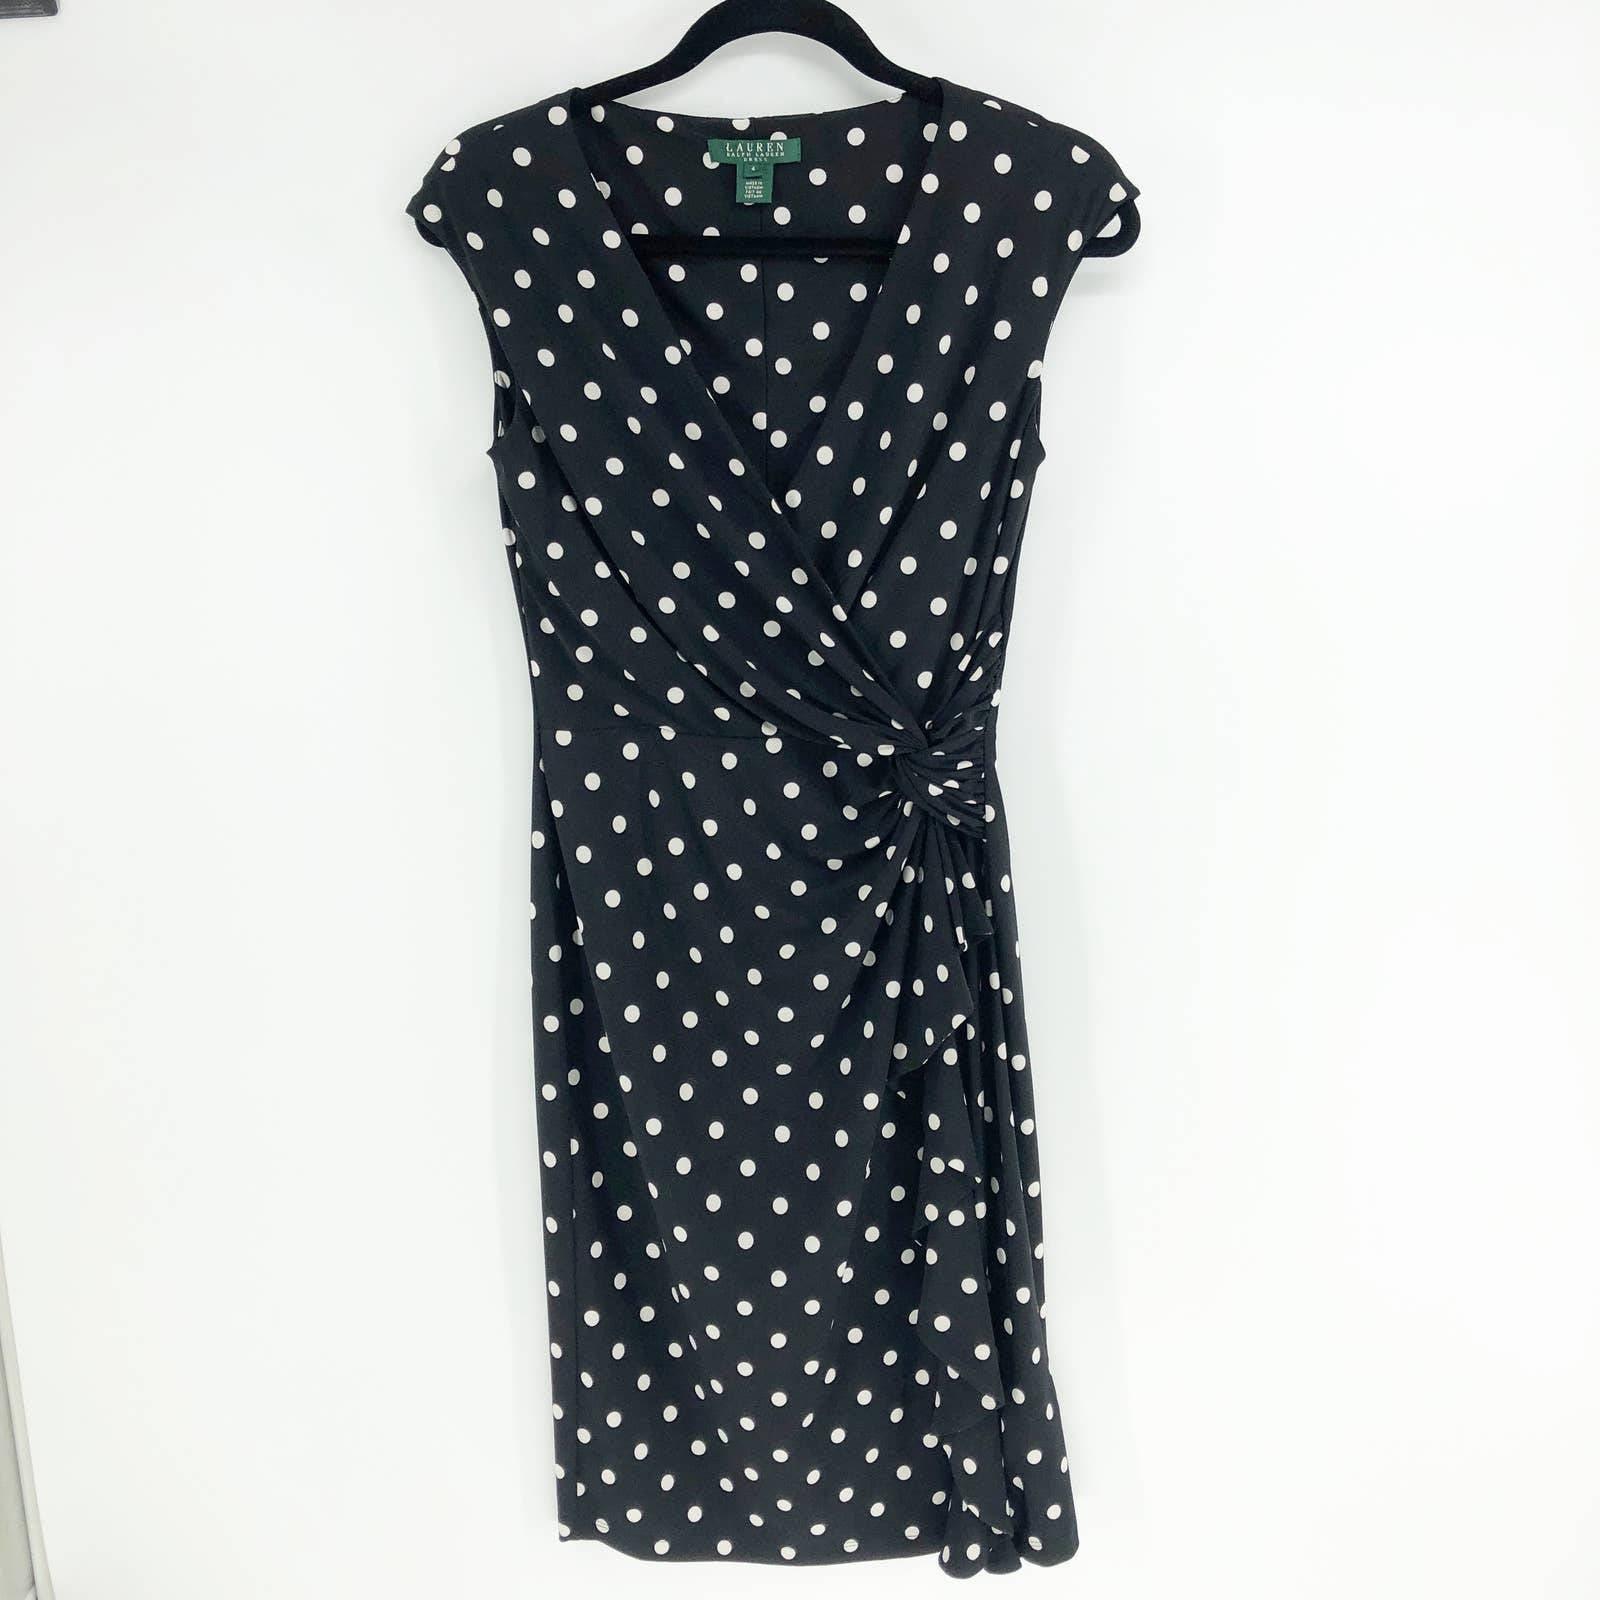 Ralph Lauren Black Cream Polka Dot Dress